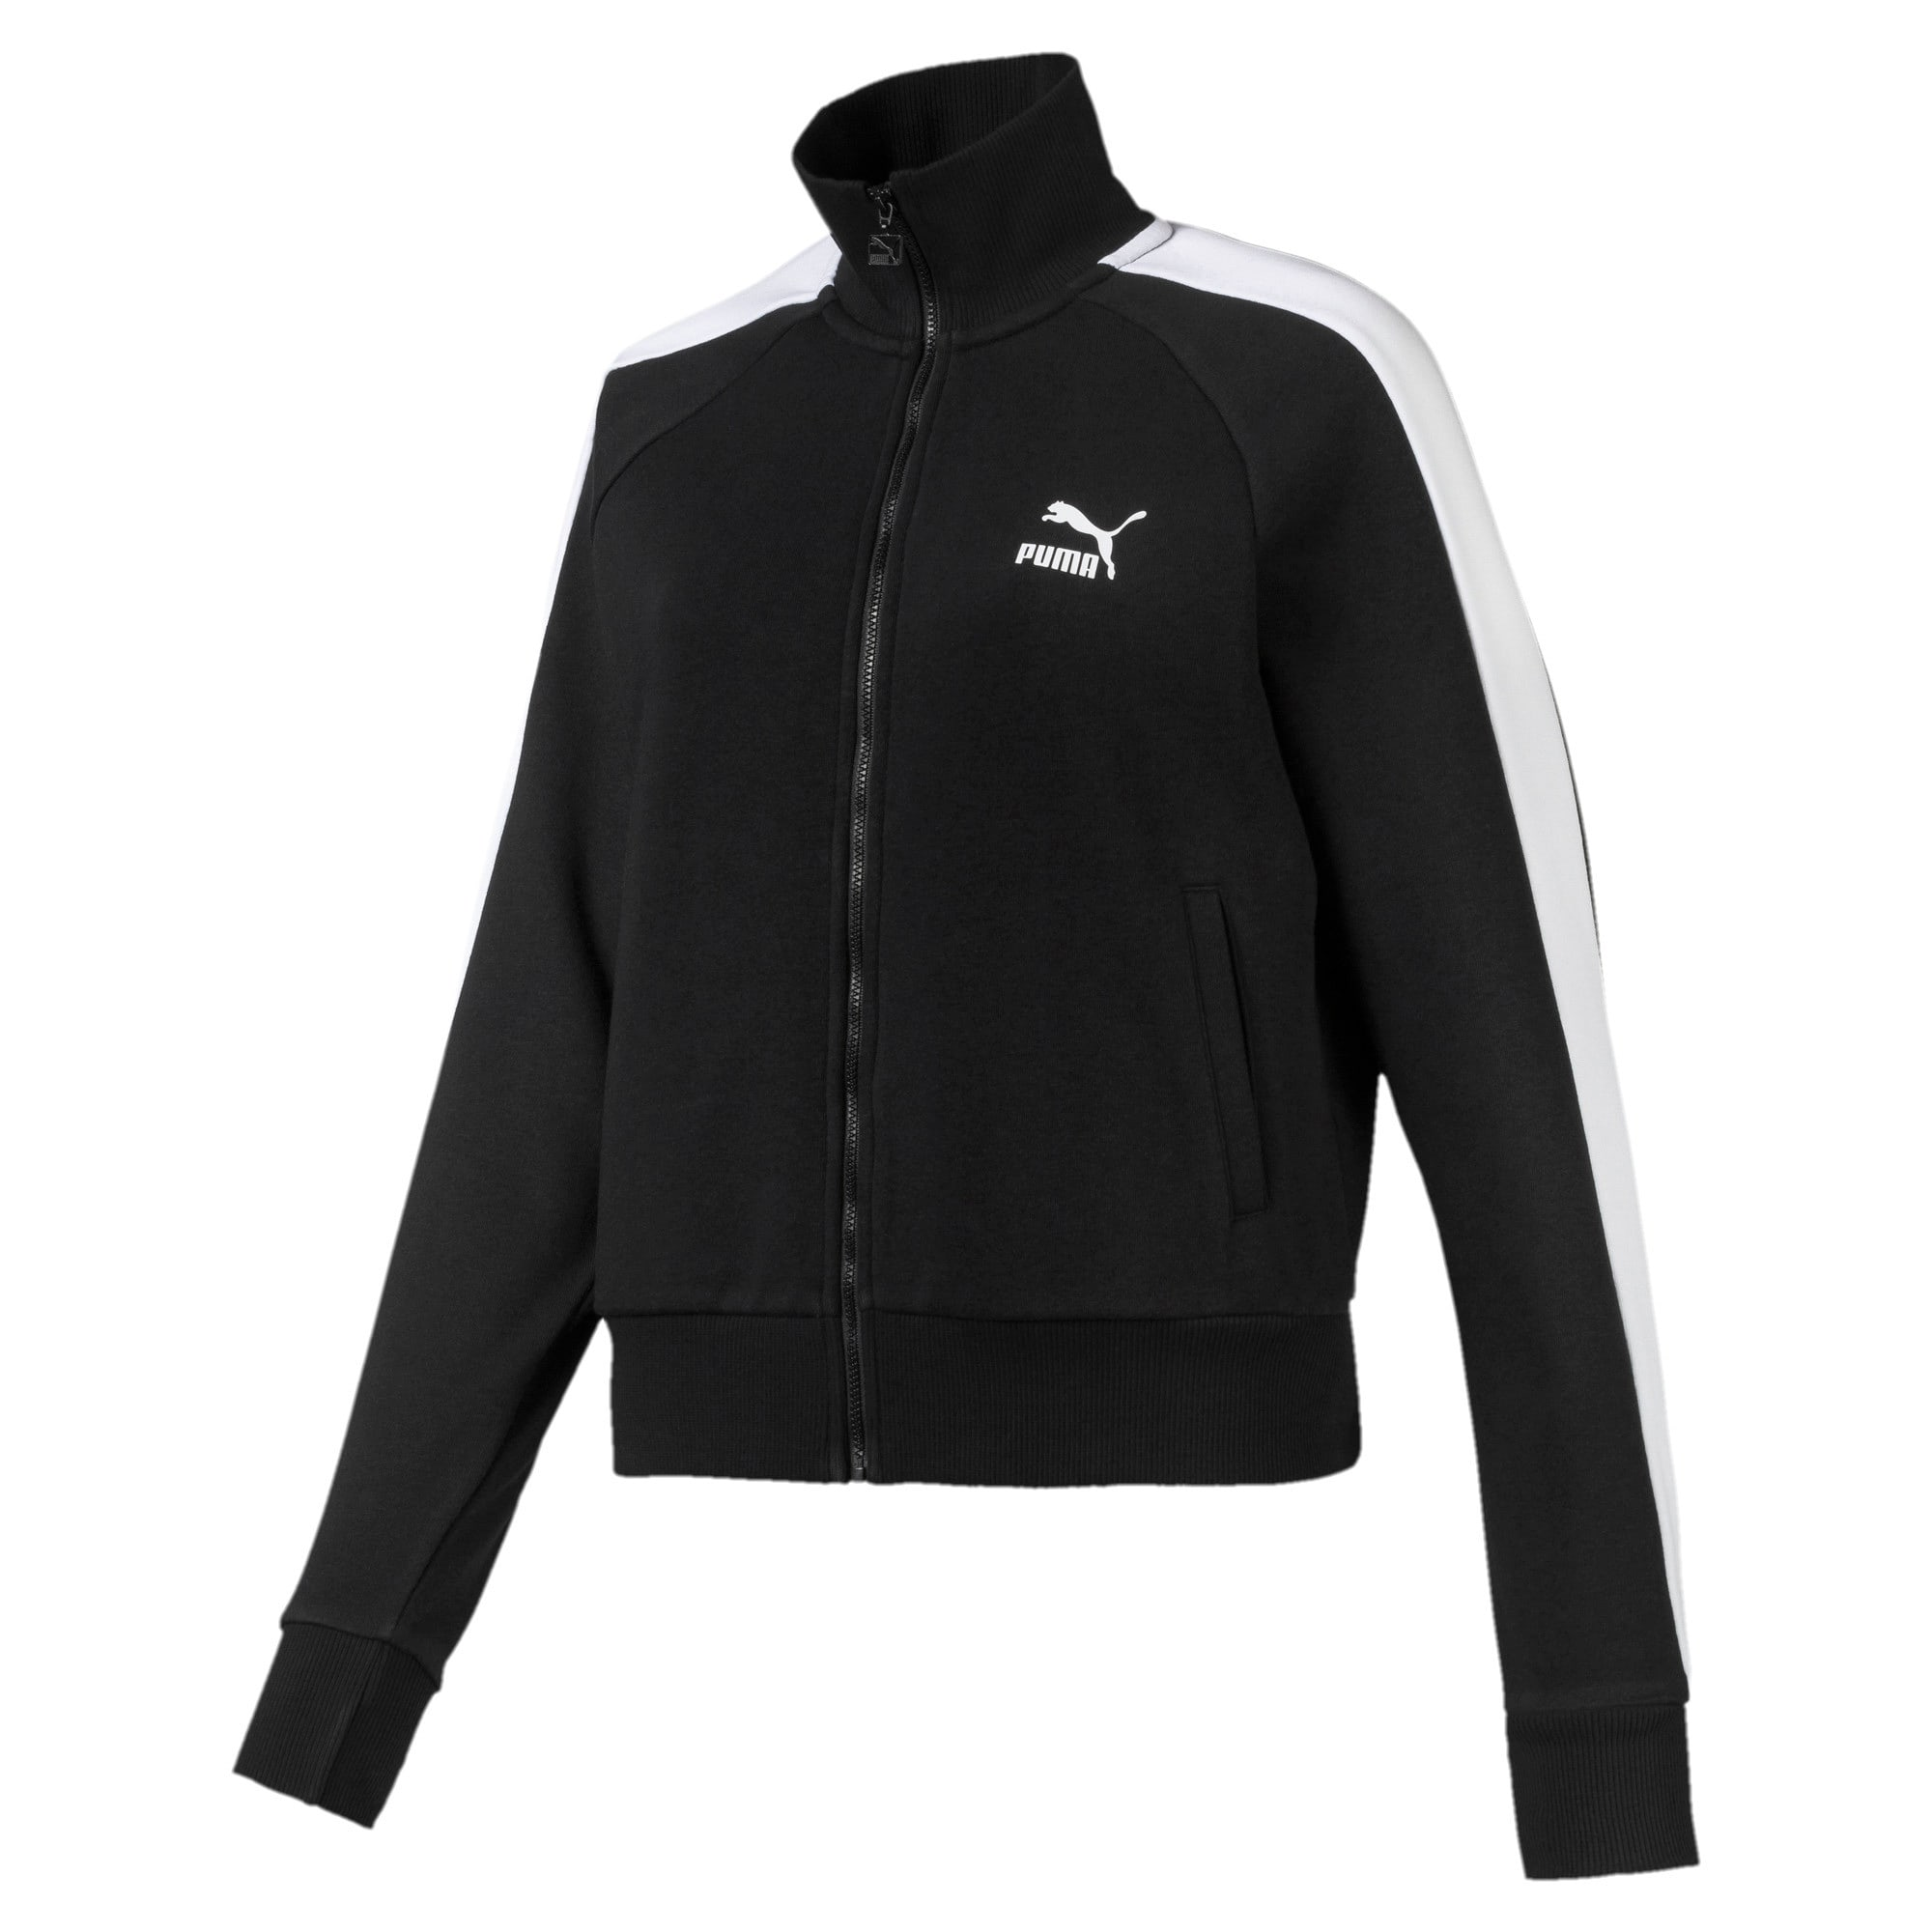 Thumbnail 1 of Classics T7 Women's Track Jacket, Puma Black, medium